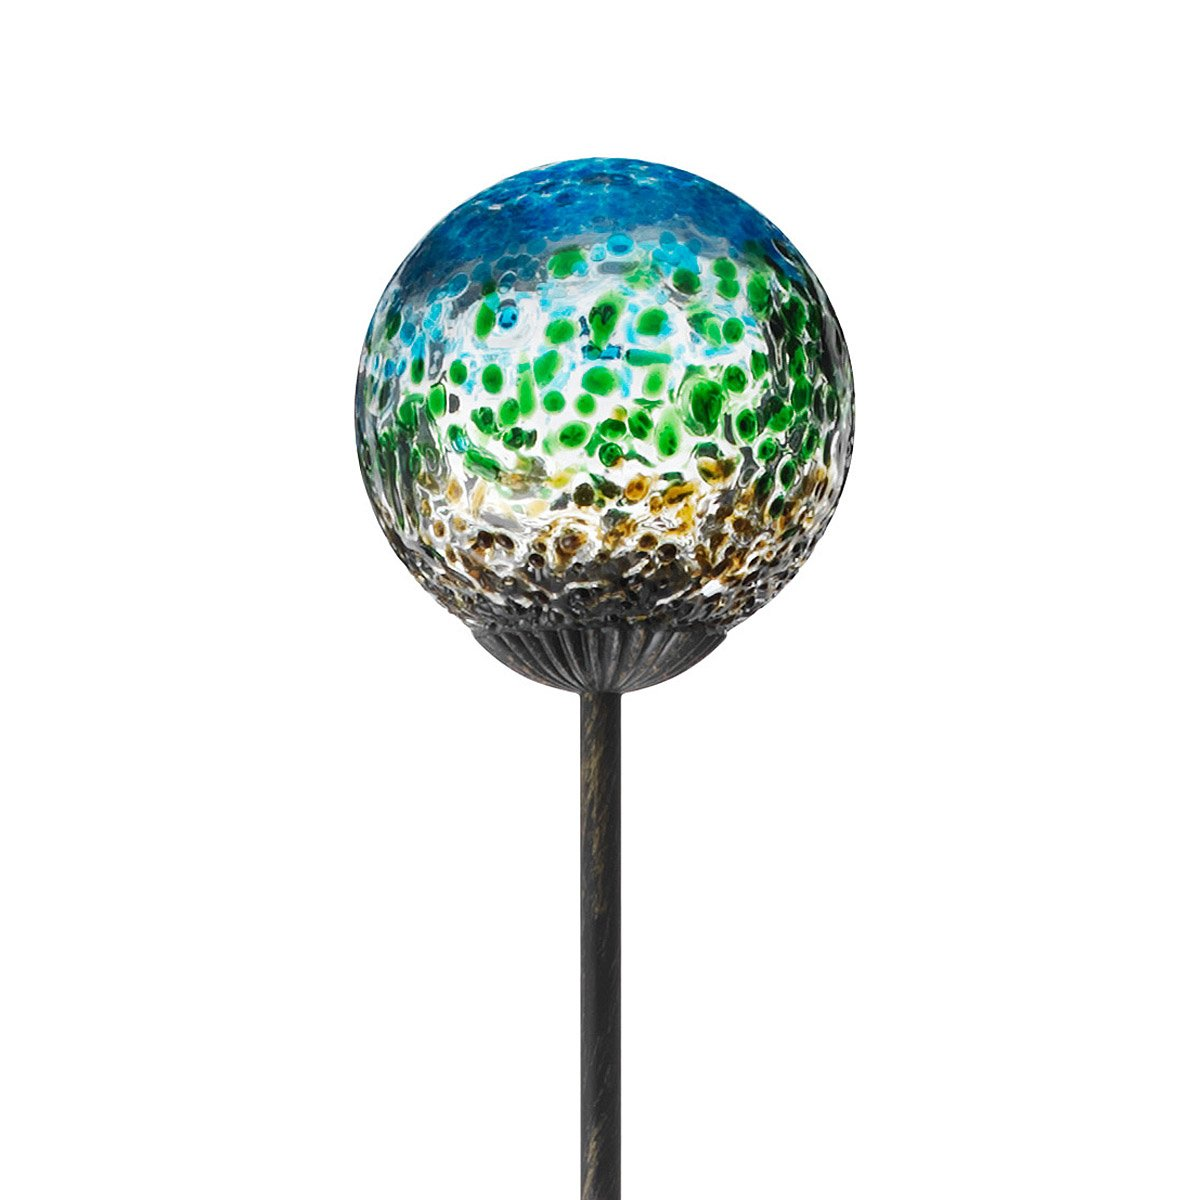 Garden Globe Lights Solar : Globe garden accessories solar powered decor outdoor lighting